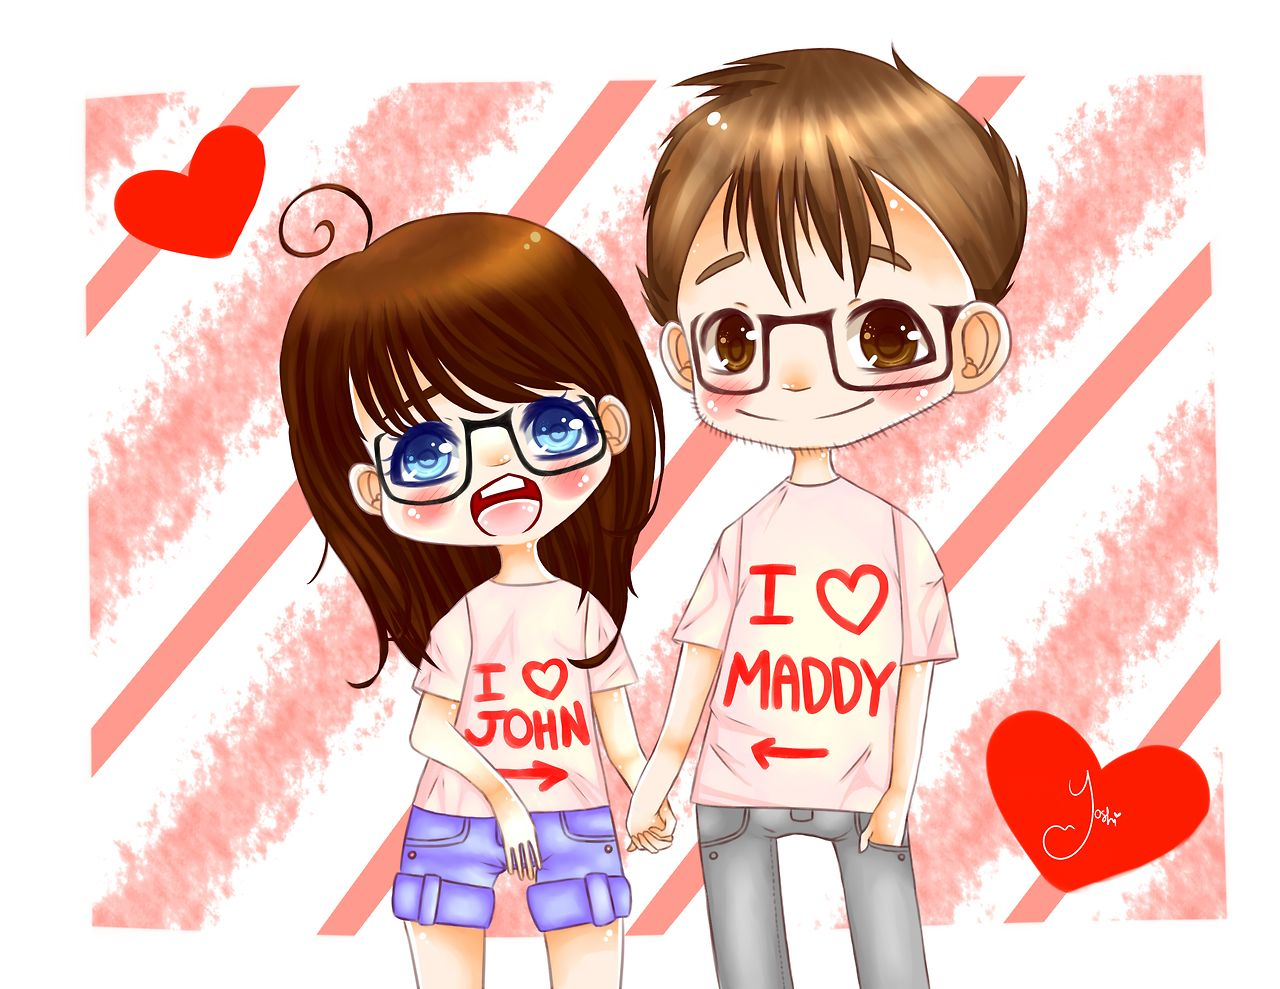 I drew me and my boyfriend John.Arent we the cutest? yoshi-xo.deviantart.com